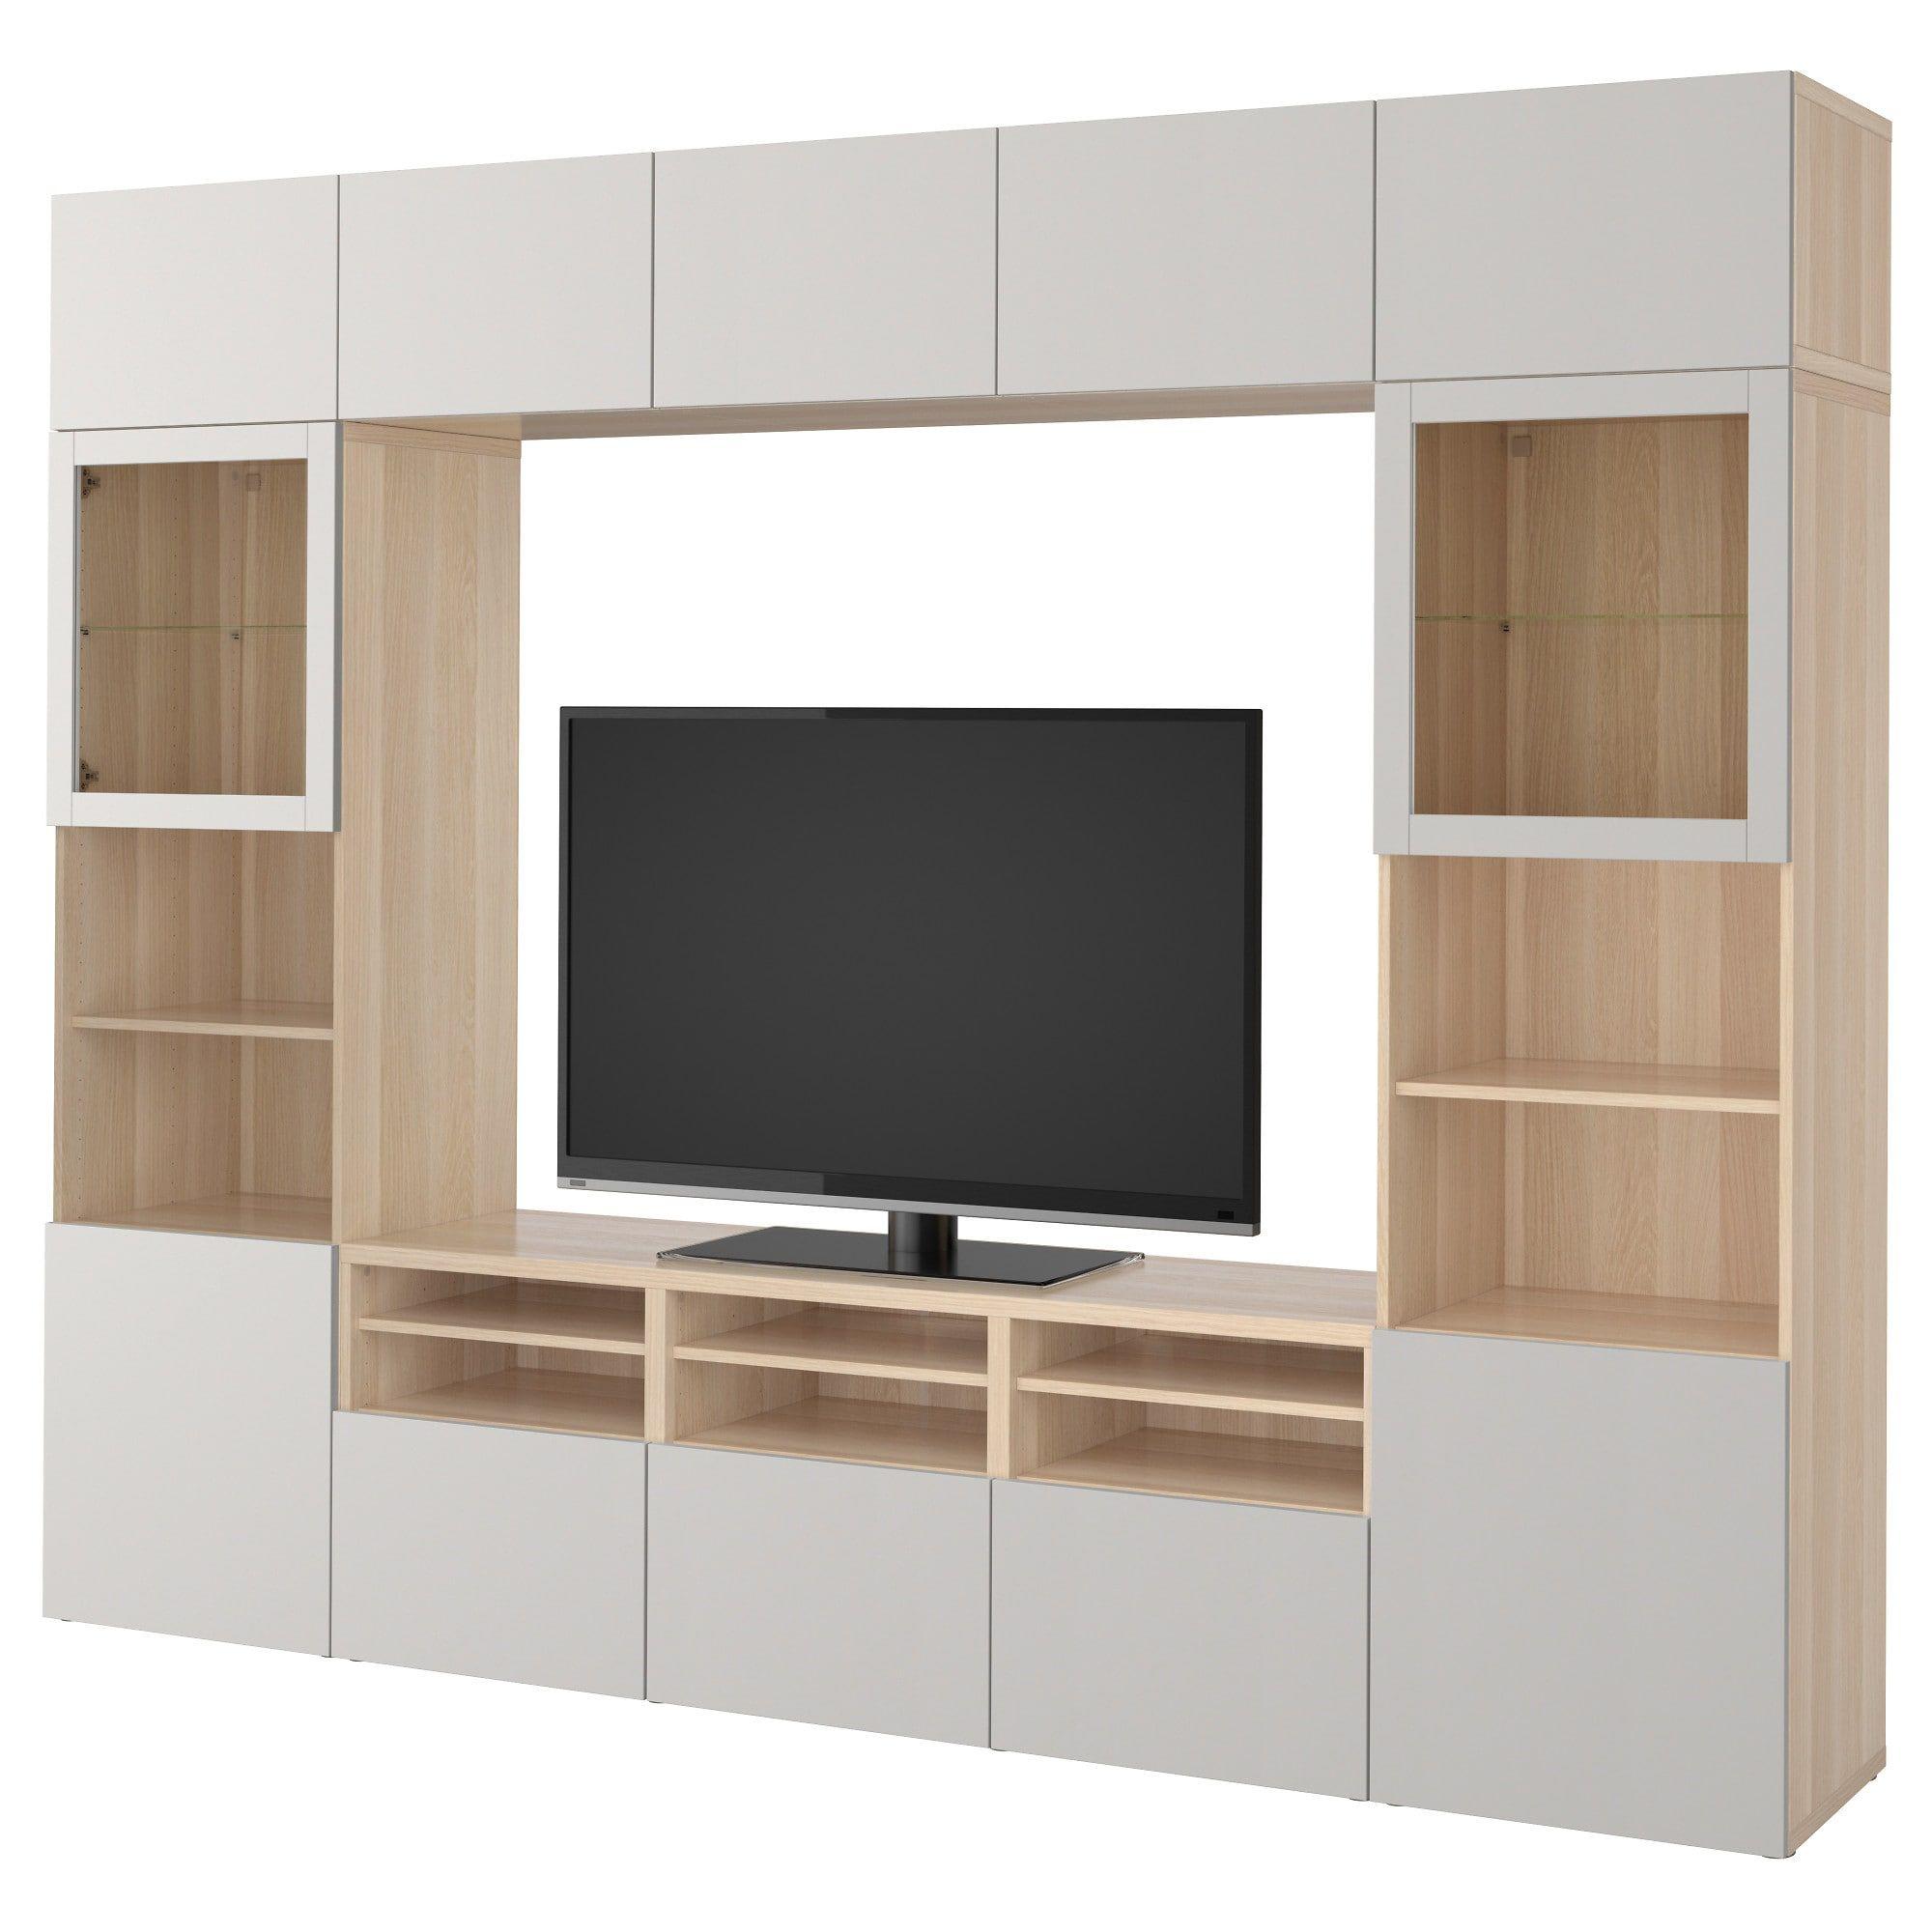 Besta Tv Storage Combination Glass Doors White Stained Oak Effect